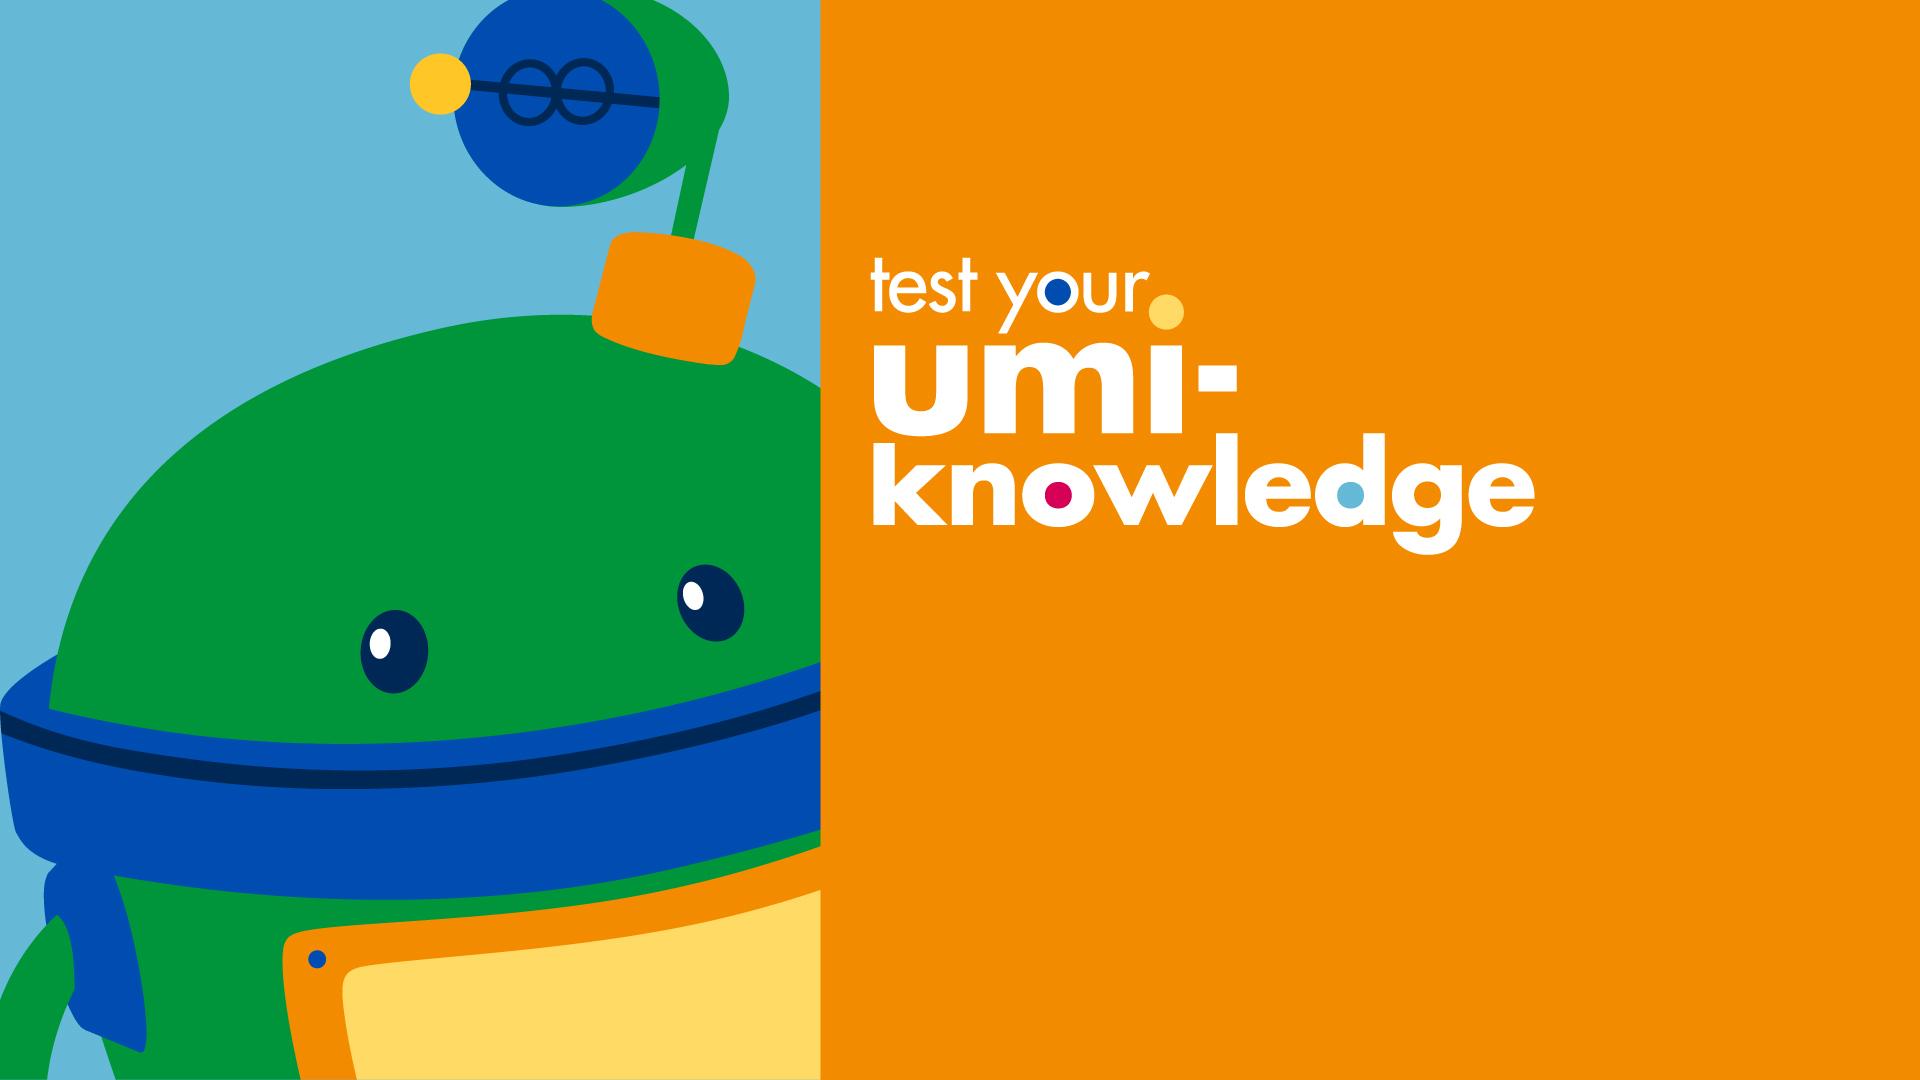 SuperFanSunday_TU_Trivia_TestKnowledge_Bot.jpg